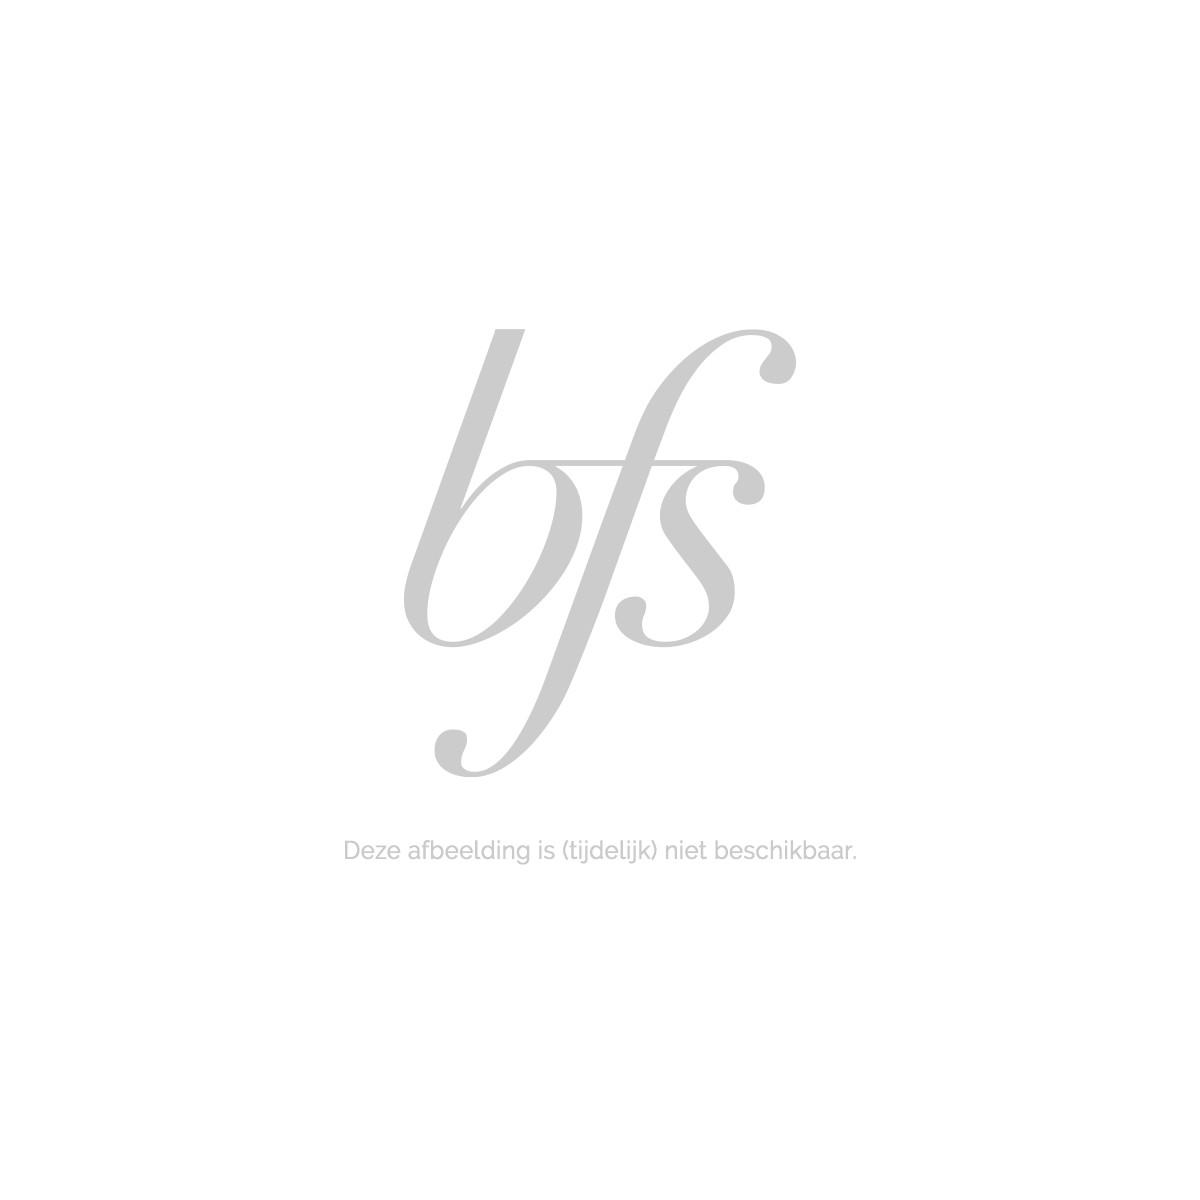 Givenchy Organza Eau de Parfum 30 ml